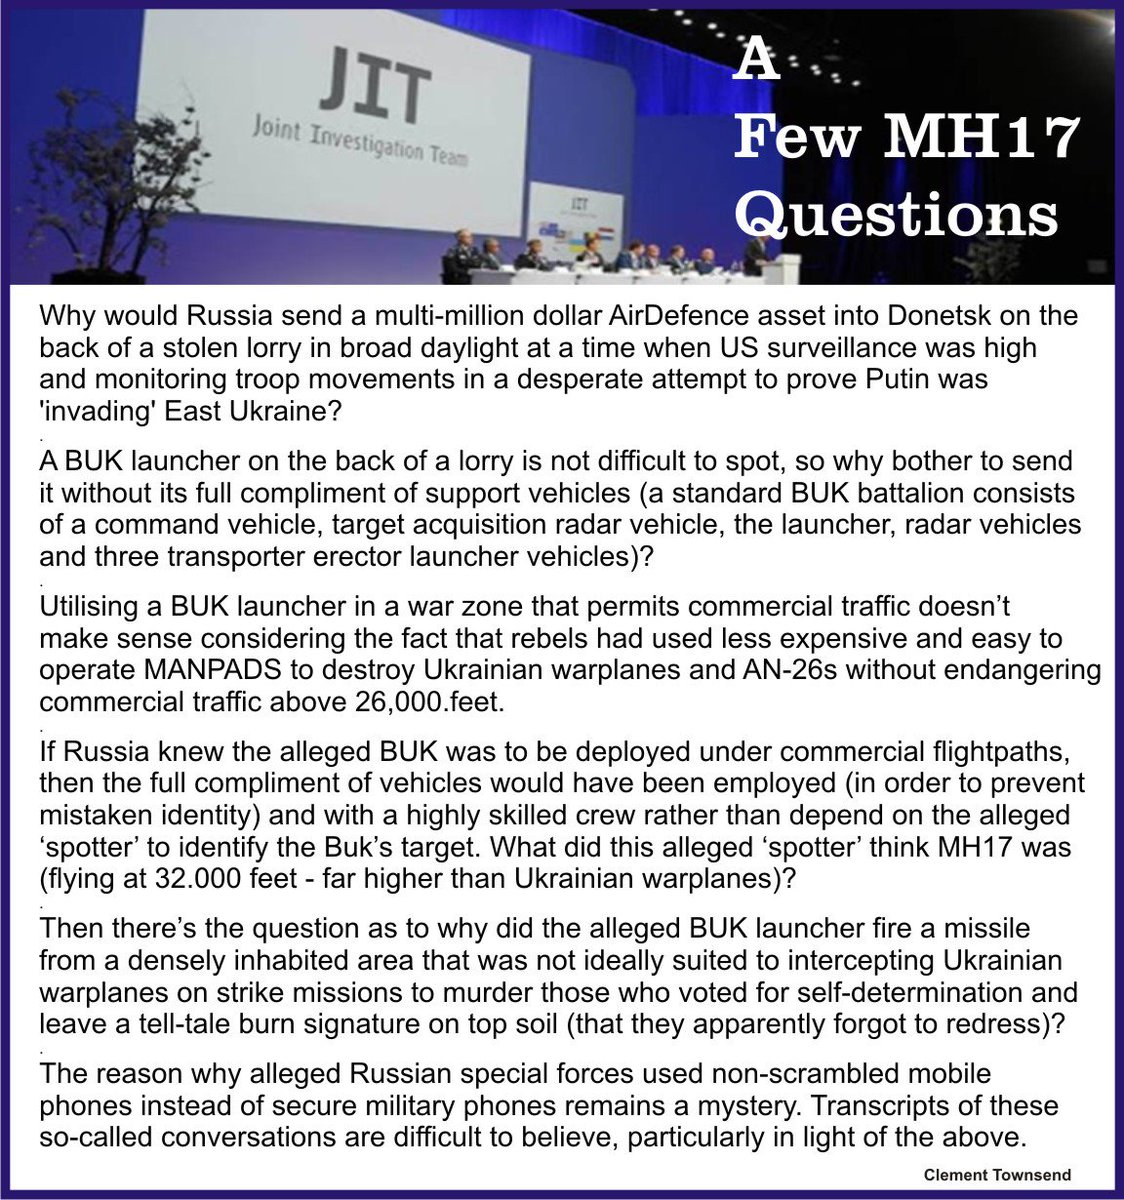 .@MH17Cover_up #Netherlands #Auspol #Ukraine #Russia #US #BBCWorld  JIT questions ....  #MH17Revisted<br>http://pic.twitter.com/HmrqtgRnen